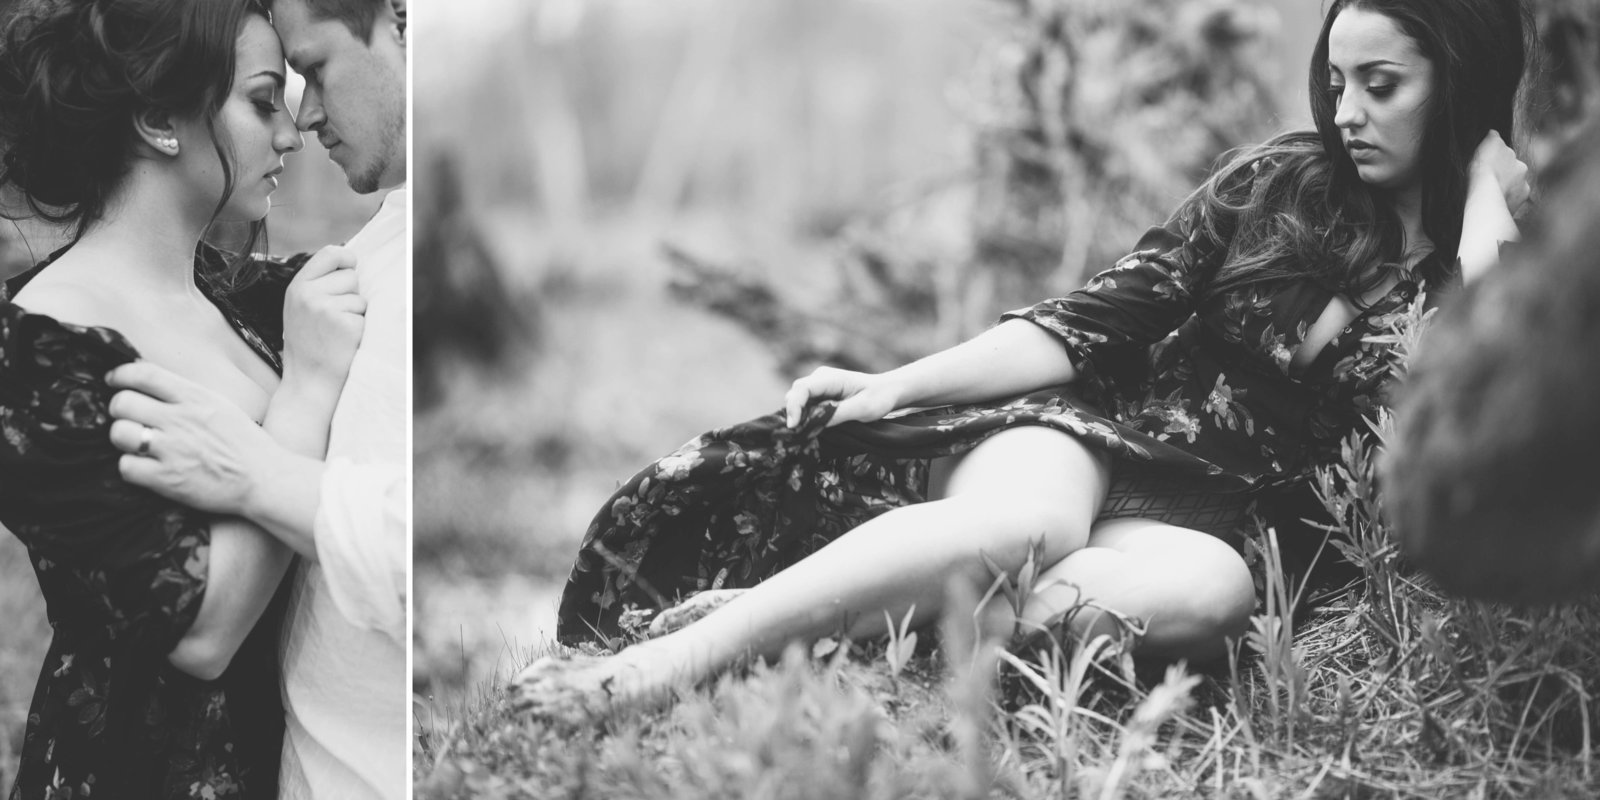 boston_saratoga_springs_boudoir_intimate_studio_photographer006